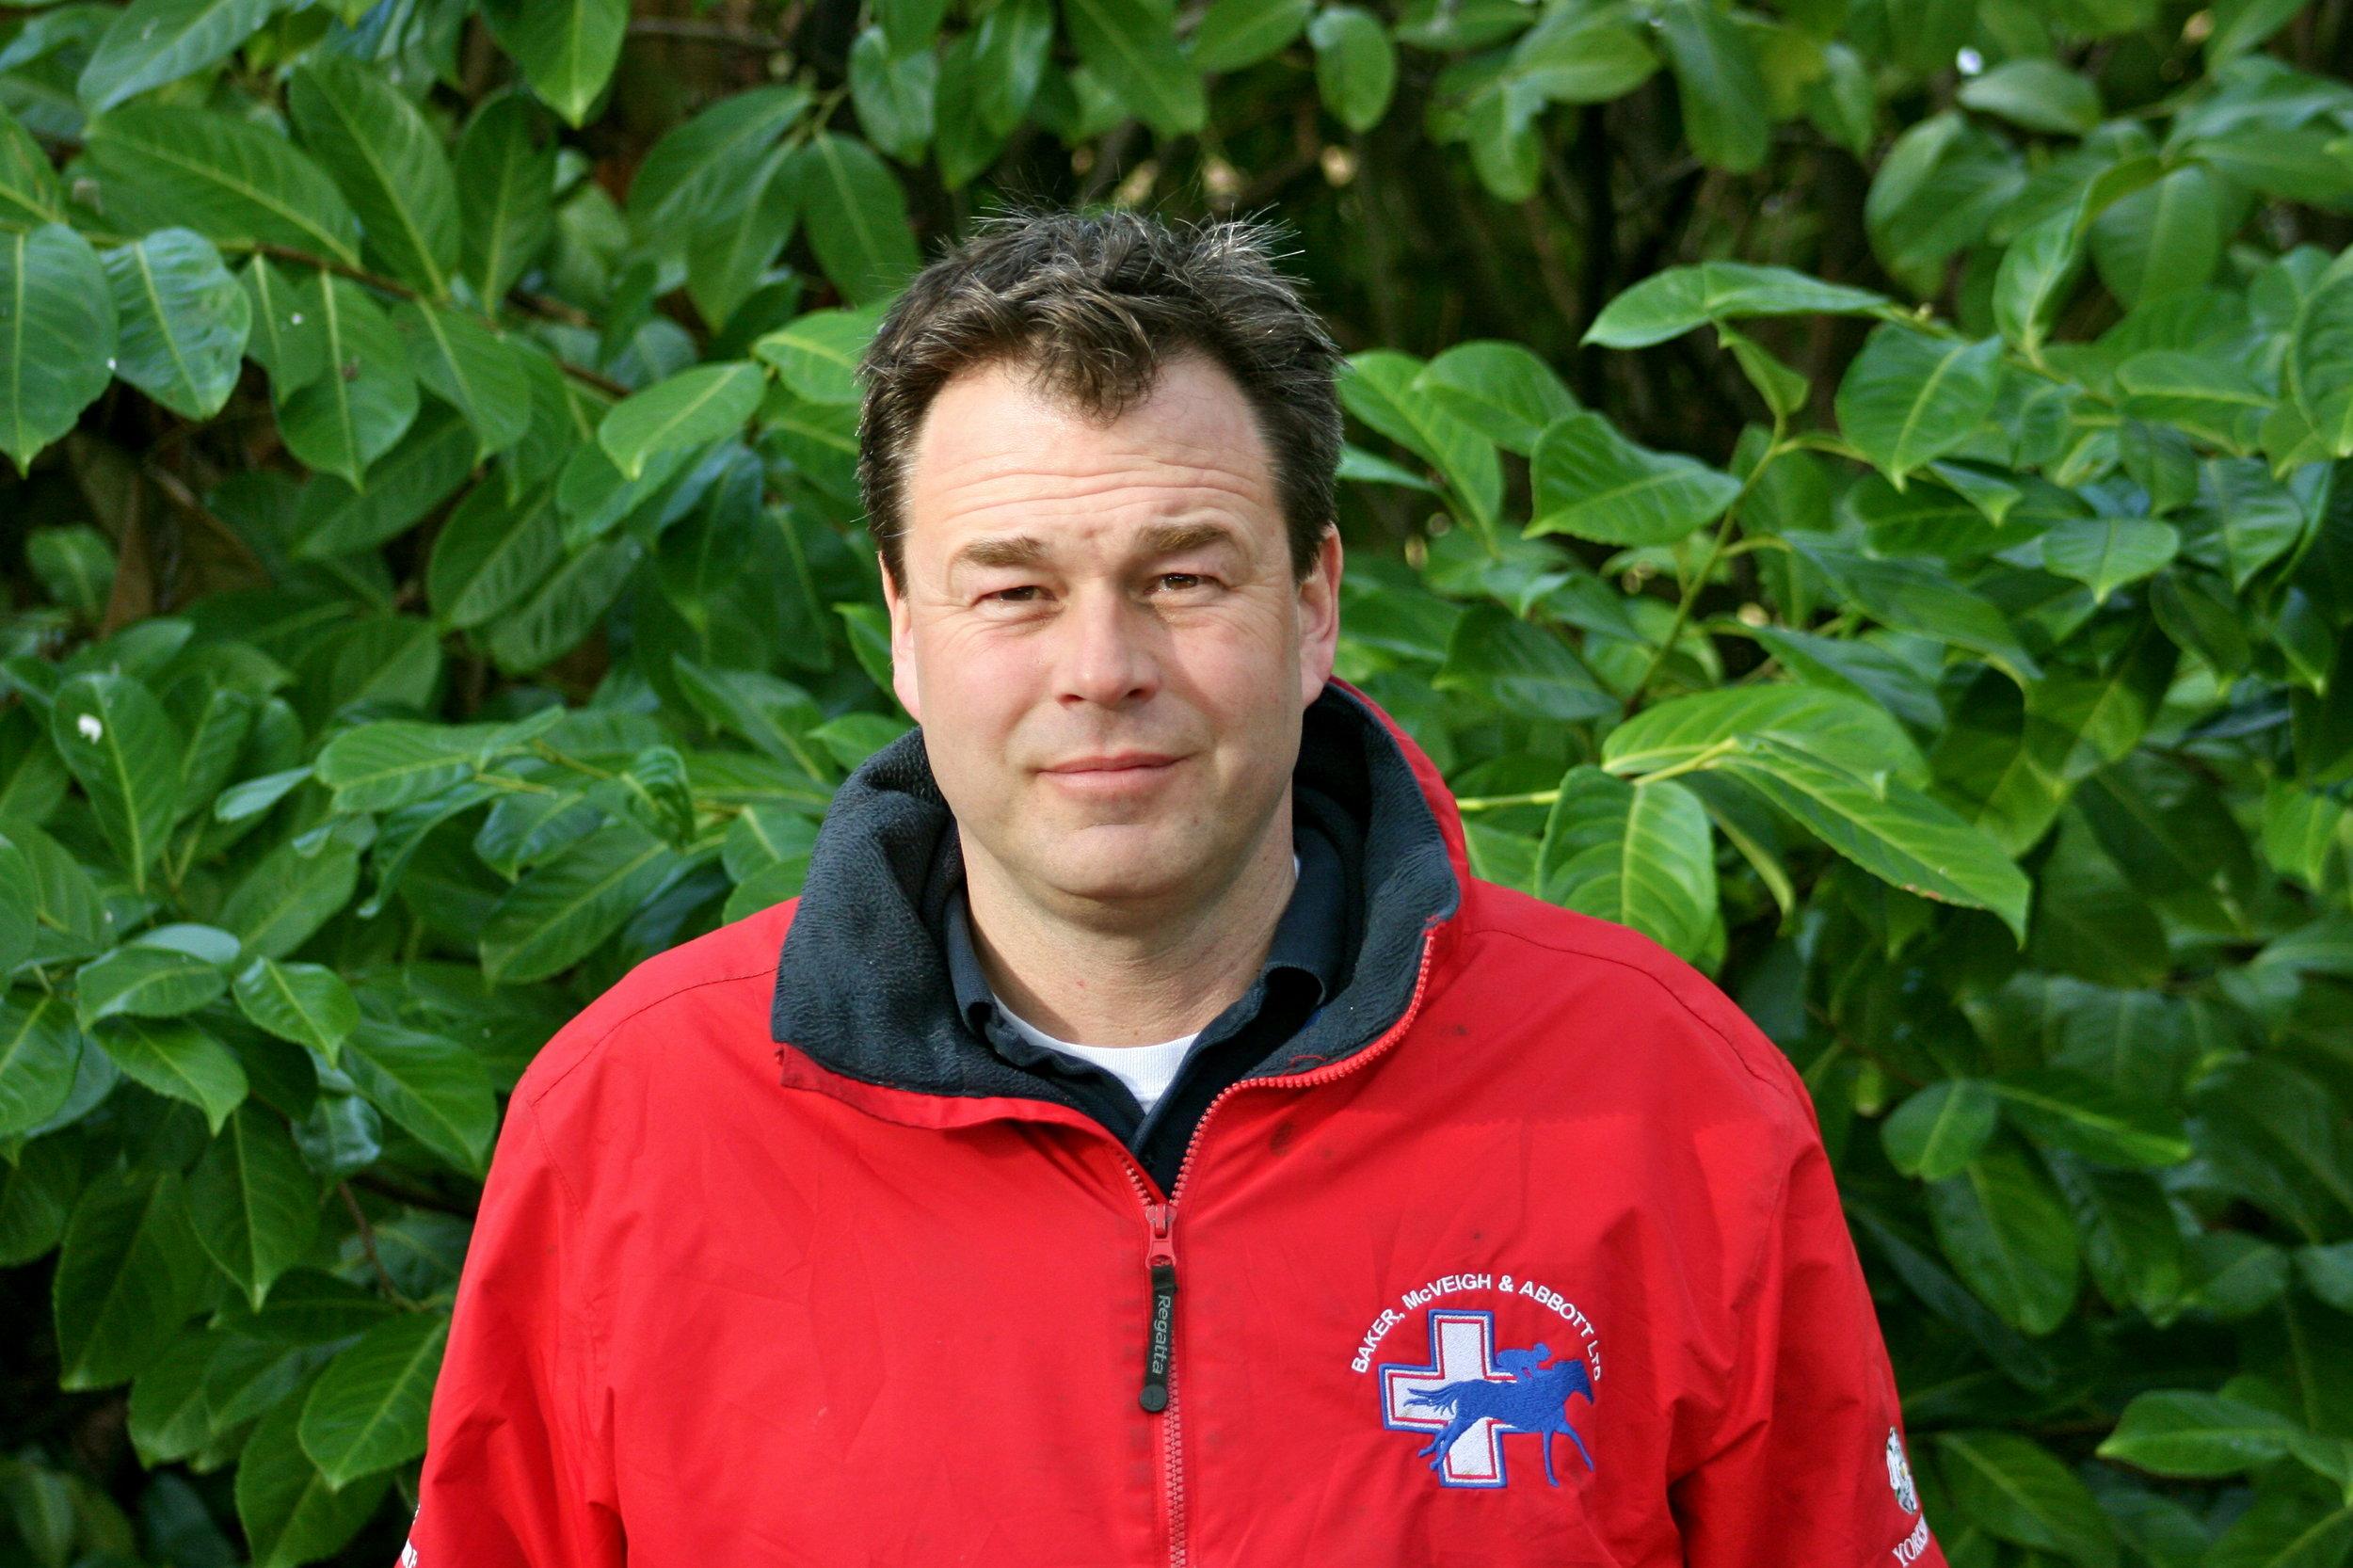 Dr Paul Lentelink